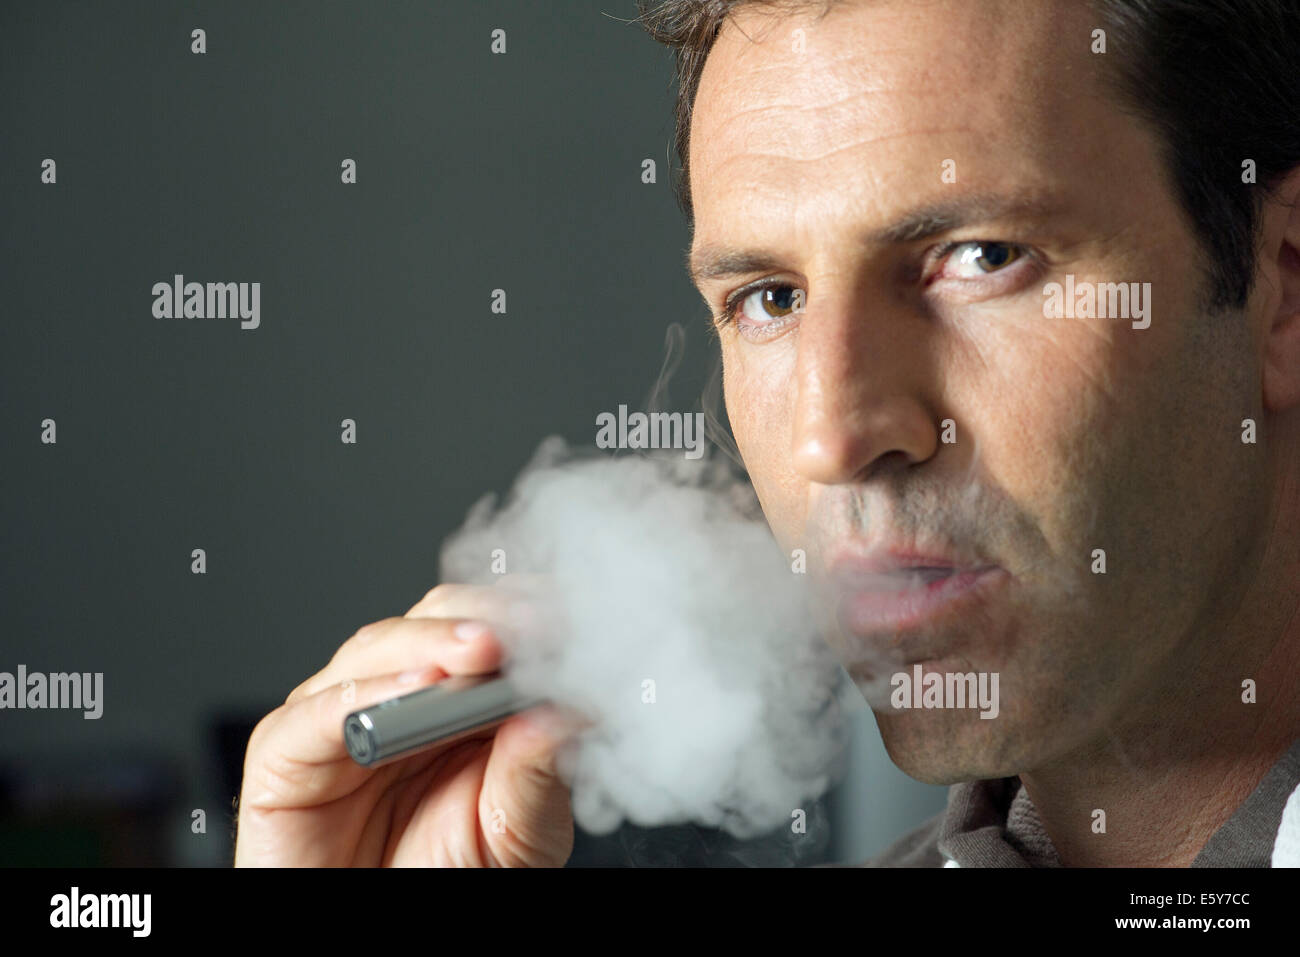 Man smoking electonic cigarette Stock Photo